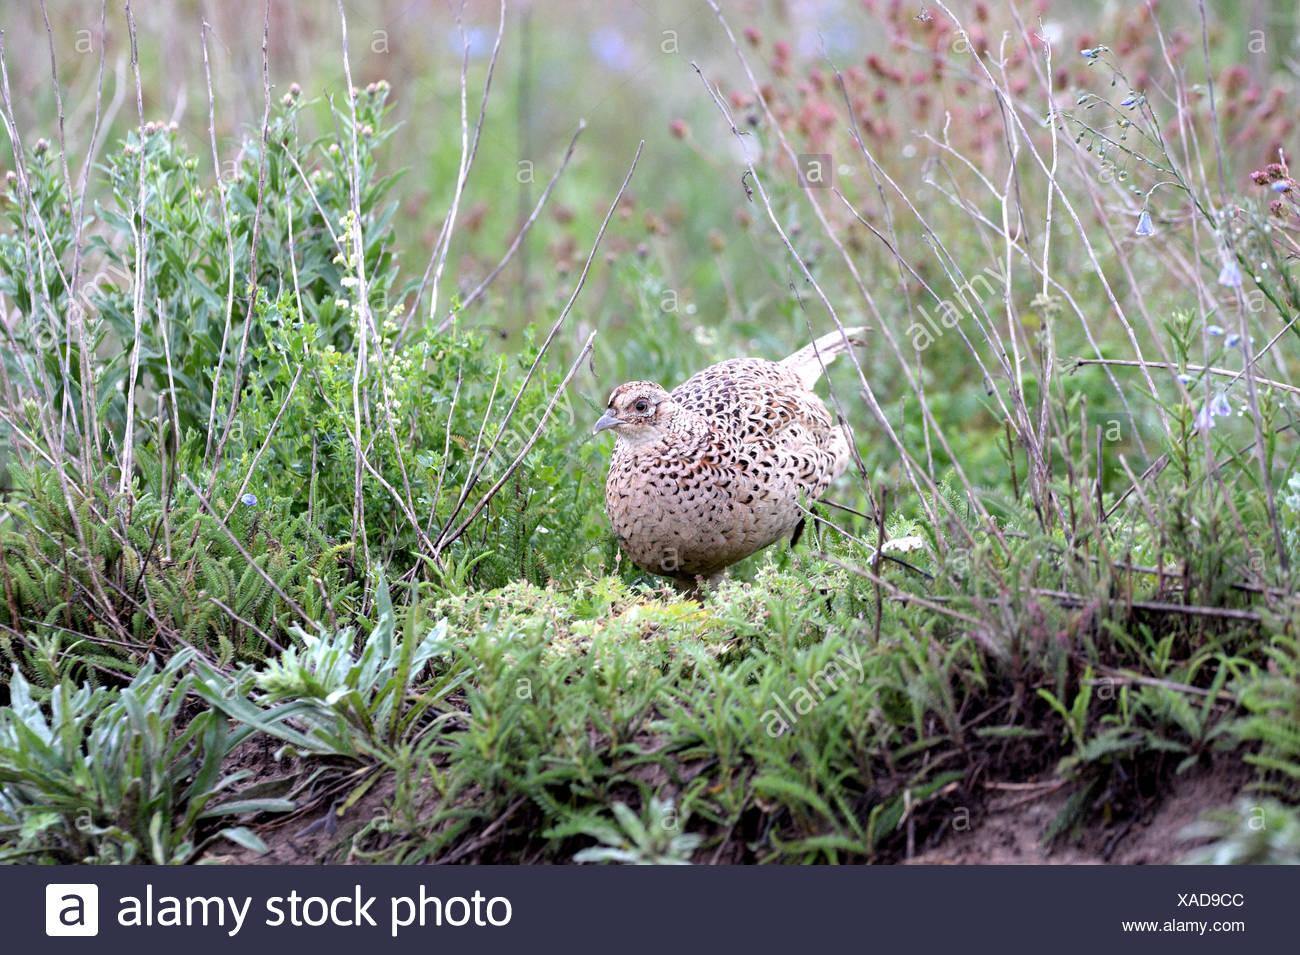 Pheasant, common pheasant, gallinaceous birds, Phasianus colchicus mongolicus, partridges, bird, galliforms, pheasants, partridg - Stock Image